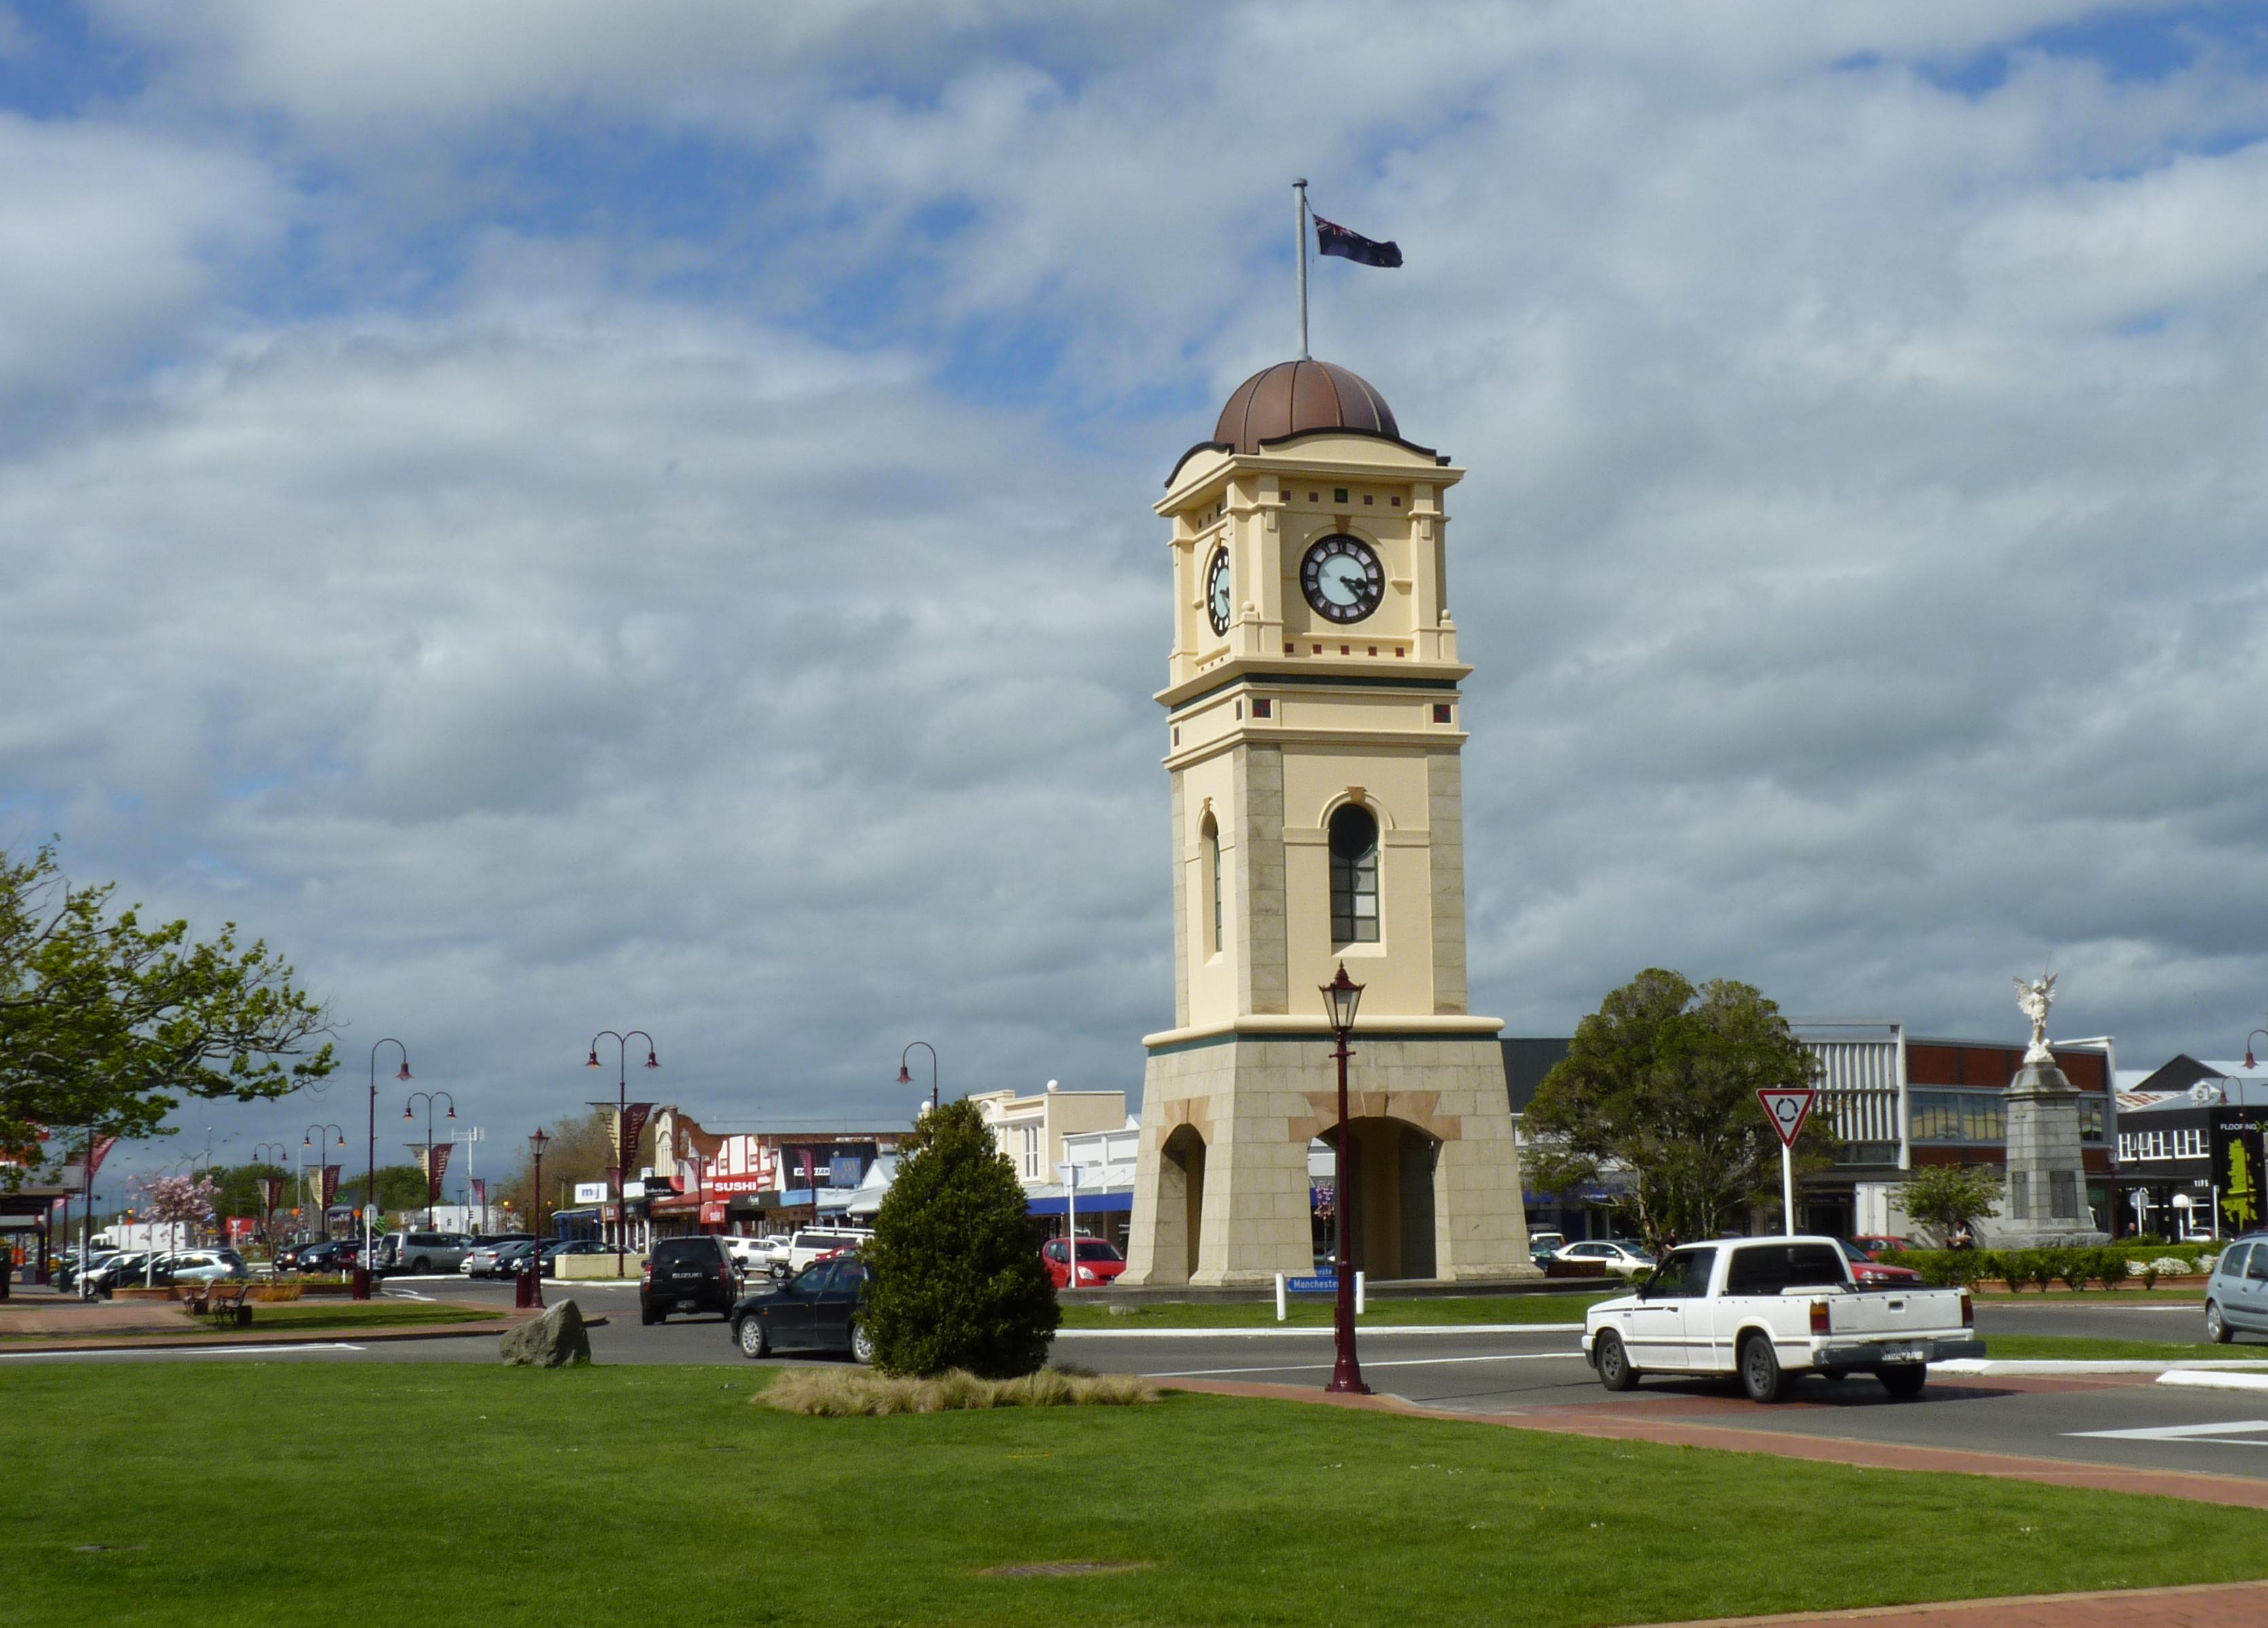 File:Square, Feilding, New Zealand 01.JPG - Wikimedia Commons